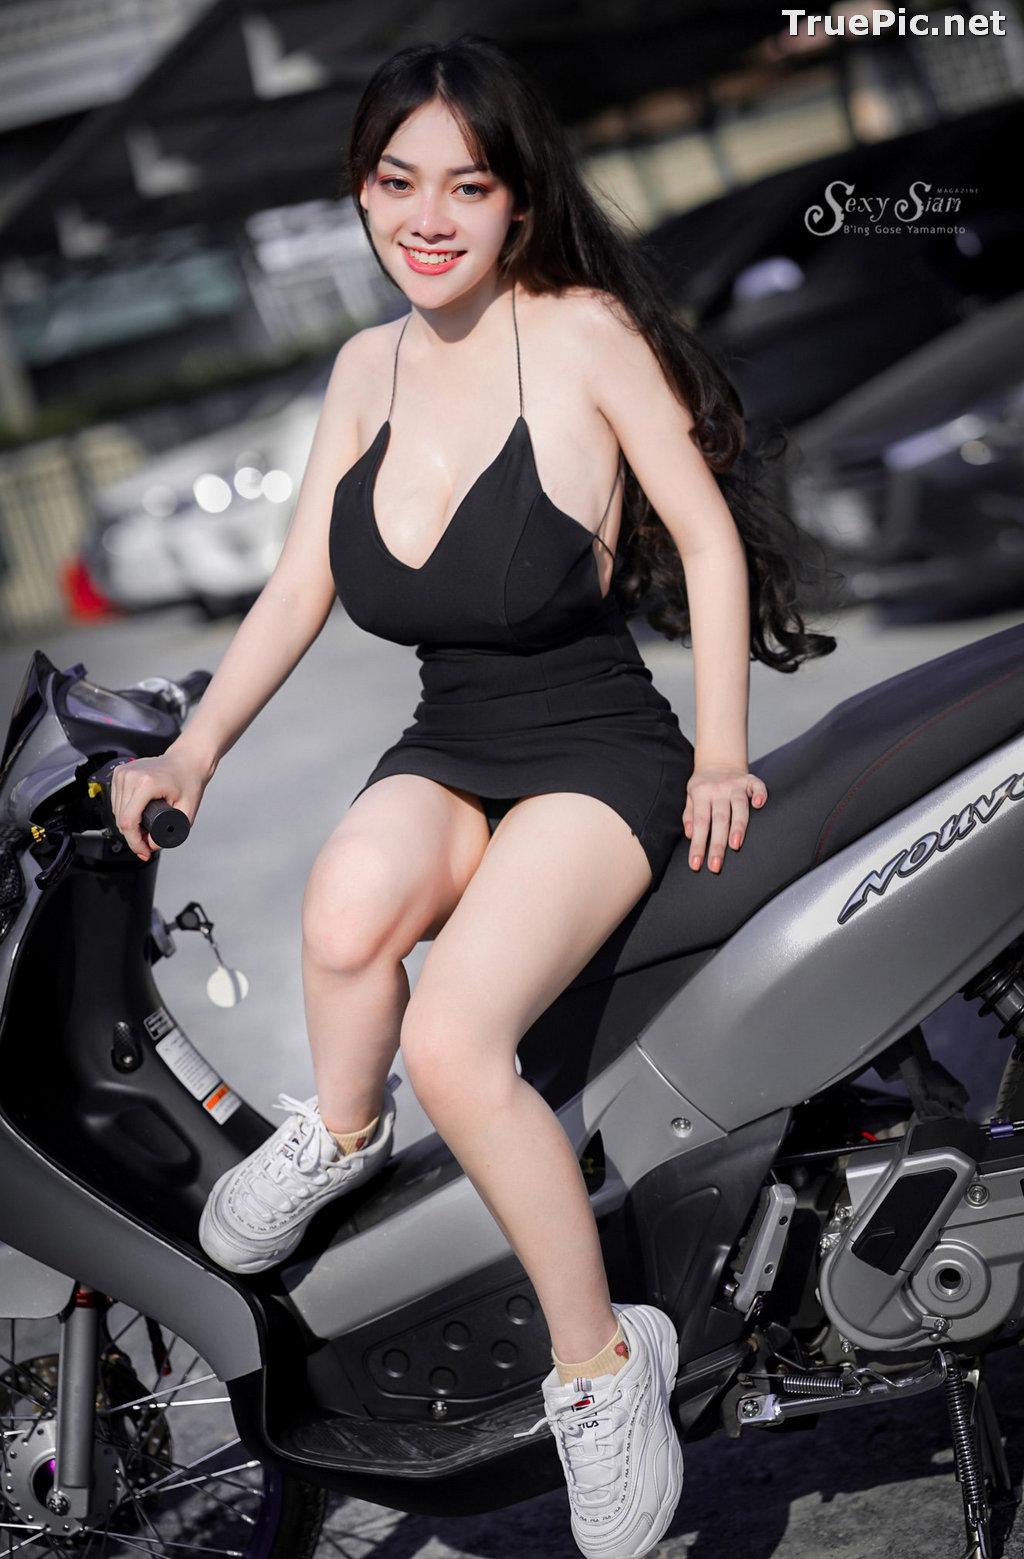 Image Thailand Model - จุ๊ปเปอร์ จุ๊ป - Sexy Black Car Girl - TruePic.net - Picture-3